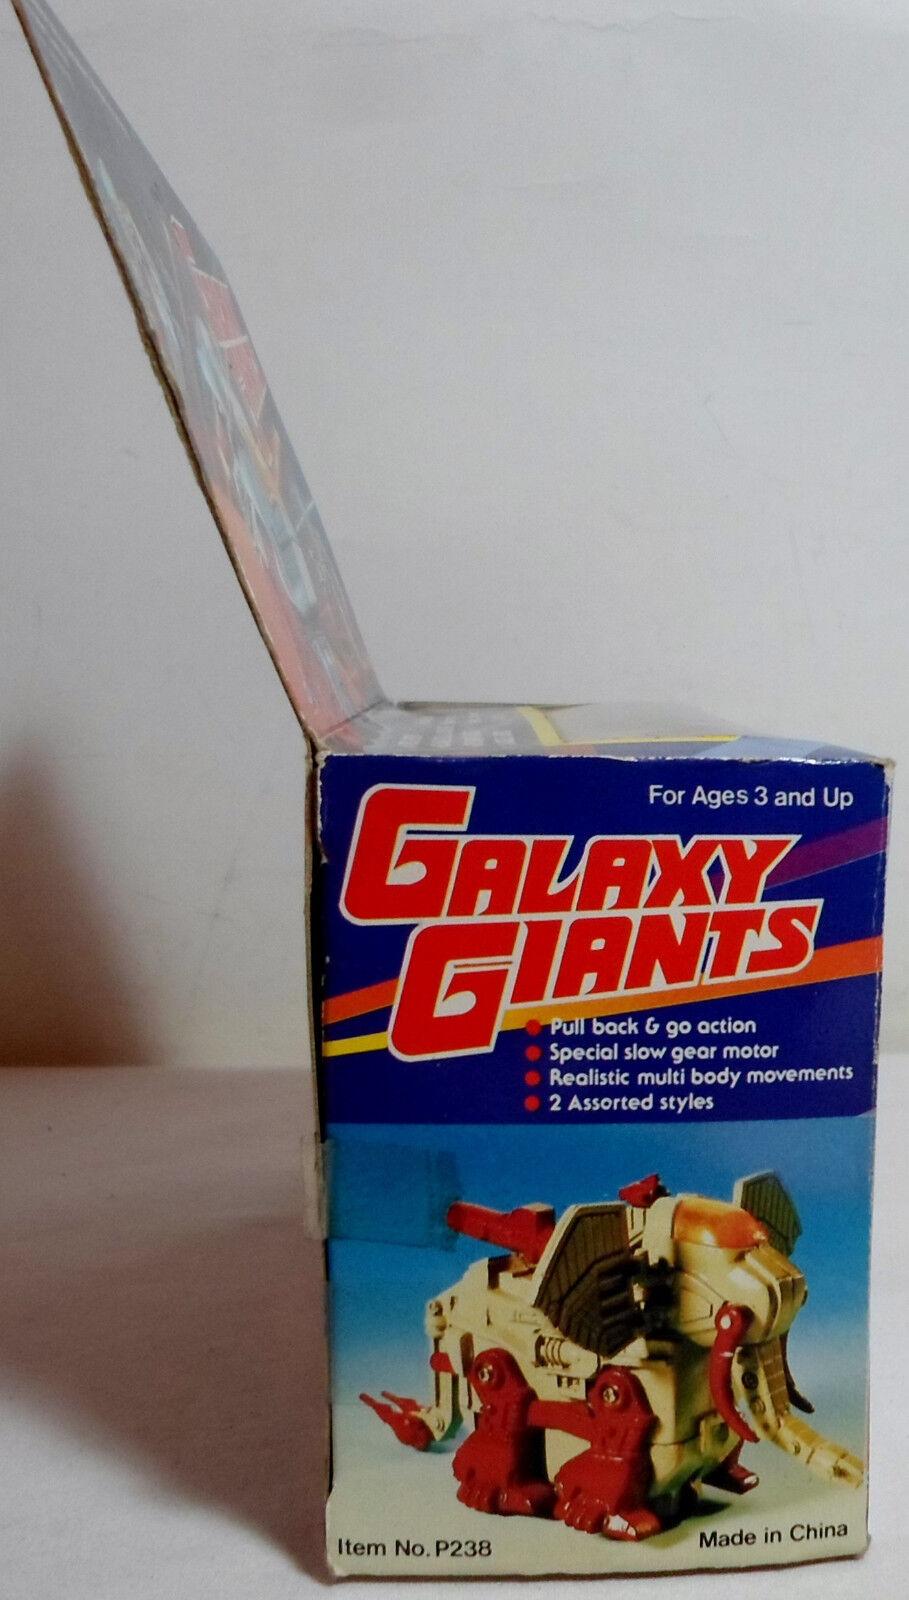 GALAXY GIANTS VTG 80'S RETRO FRICTION ROBOT ZOID PULL BACK BACK BACK ACTION SEALED BOX B f0ddb4